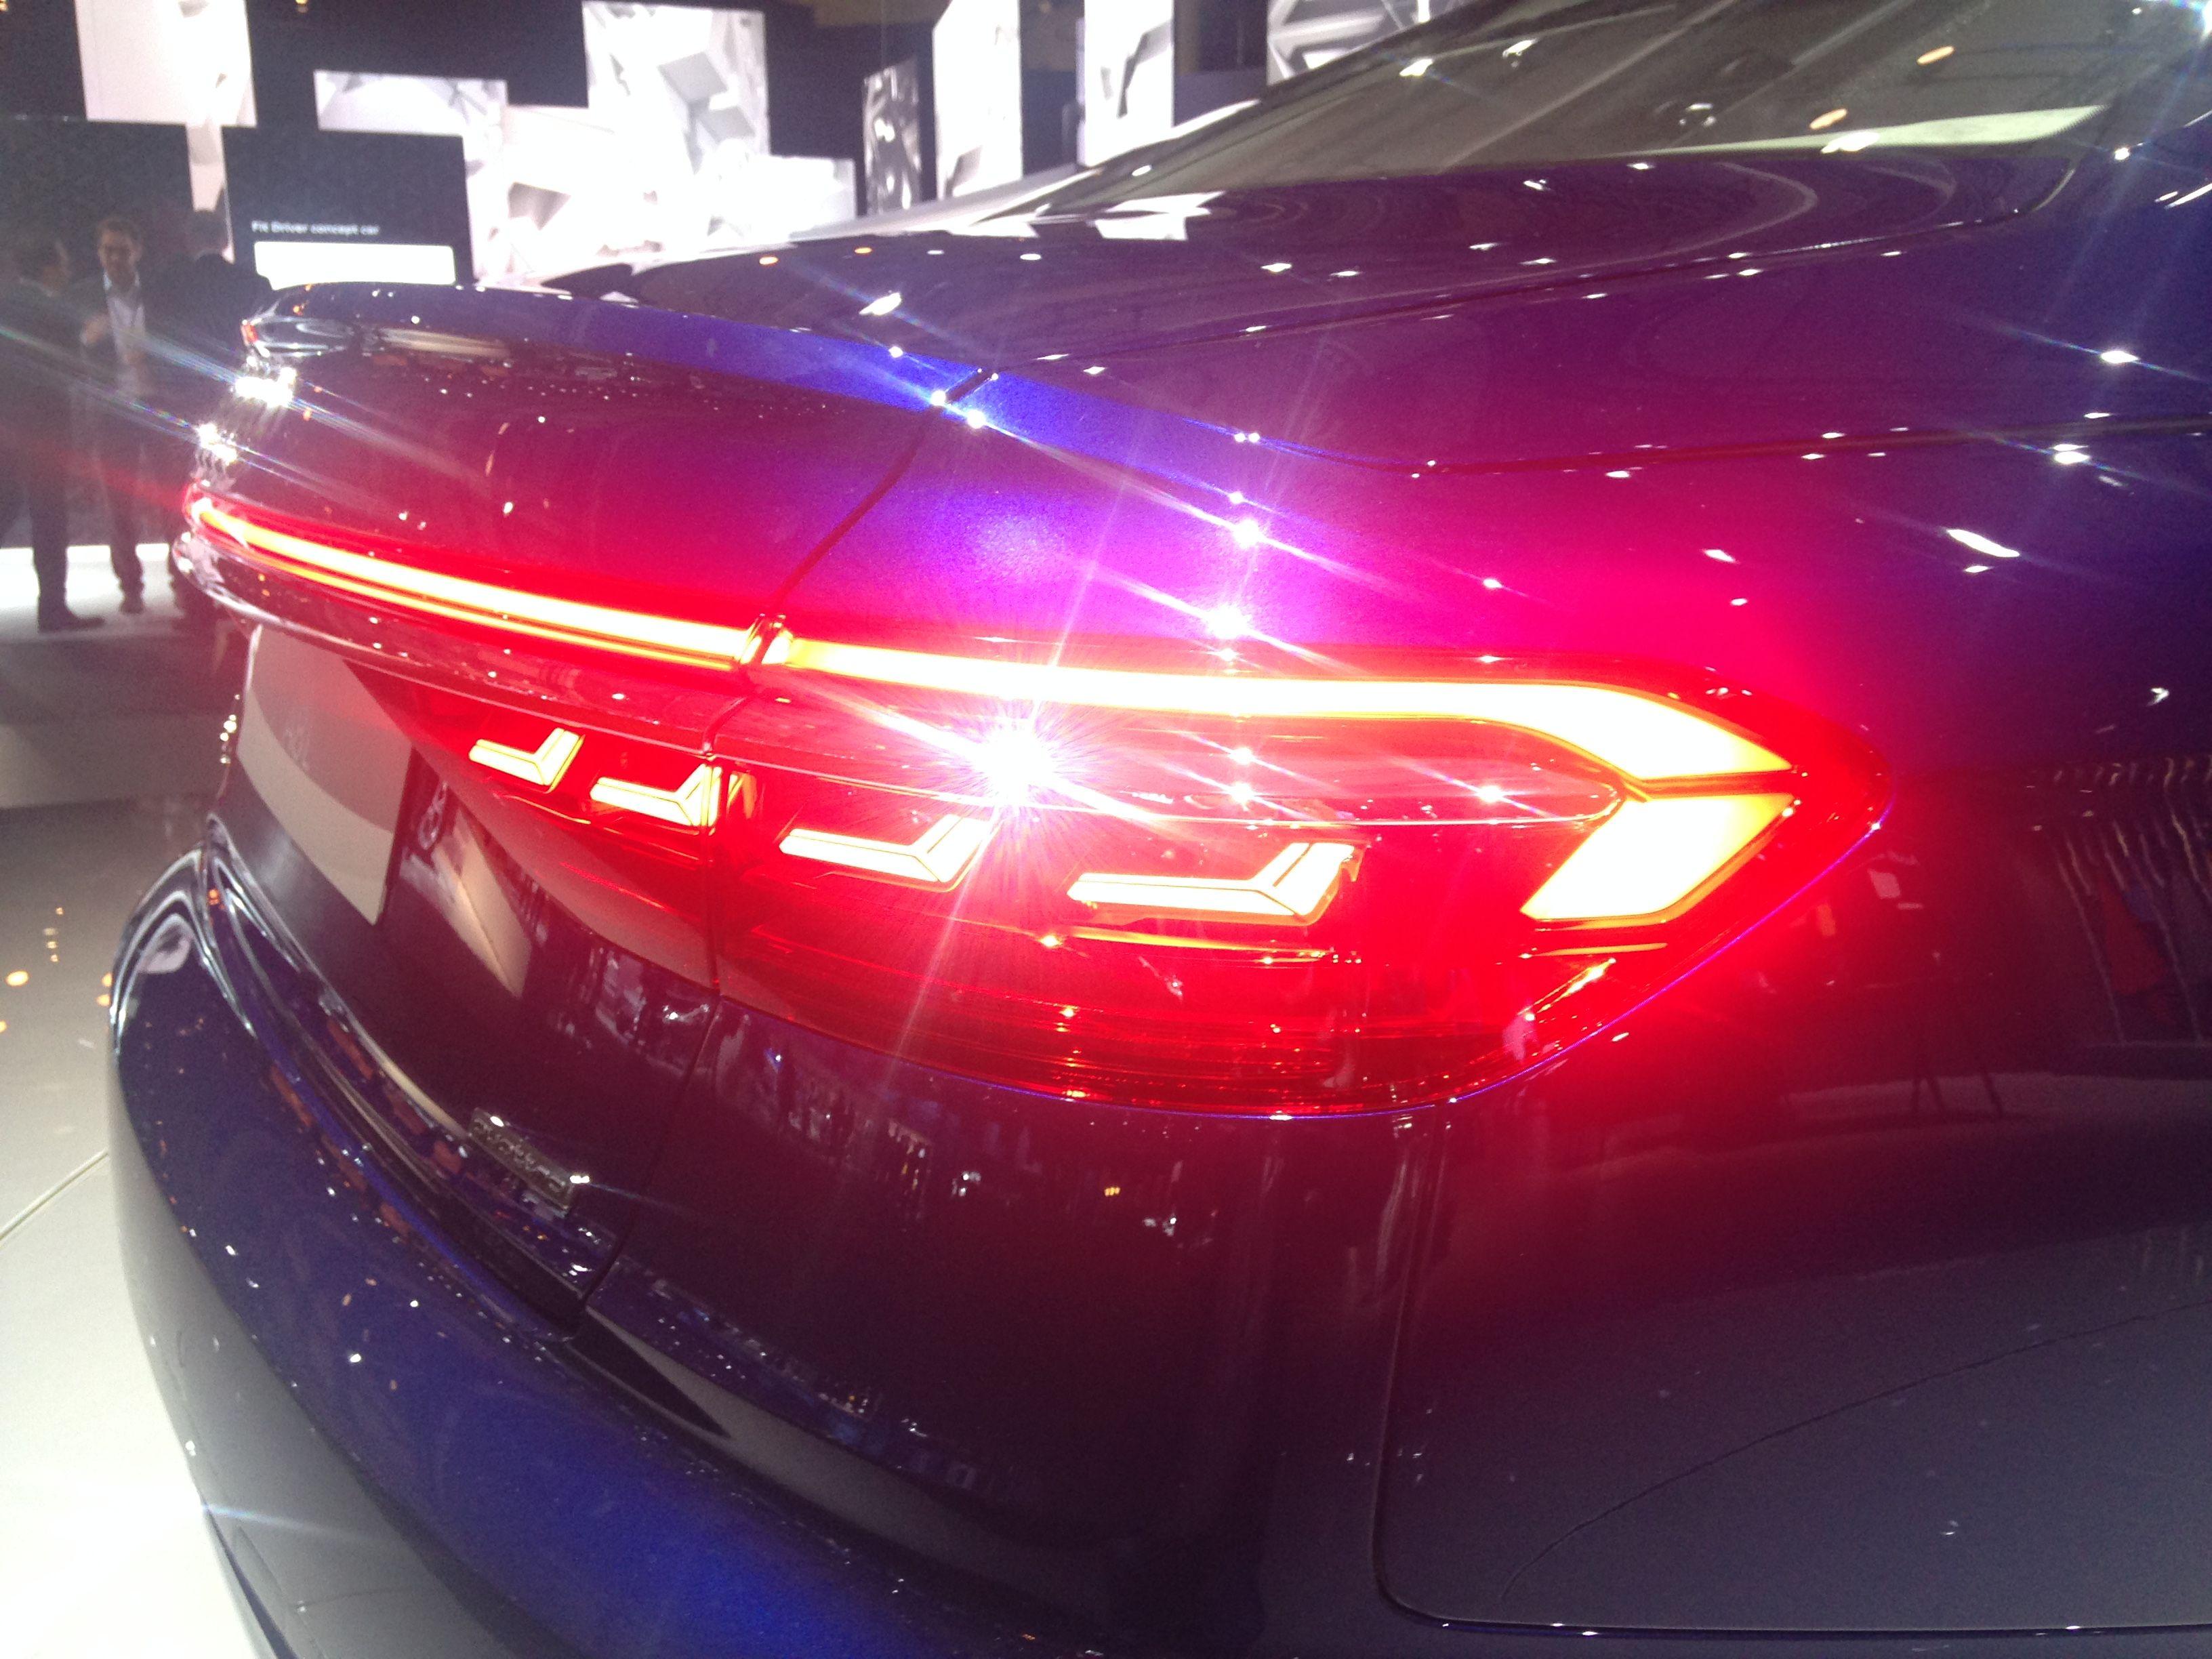 Audi A8 Oled Taillight Audi Autos Beleuchtung